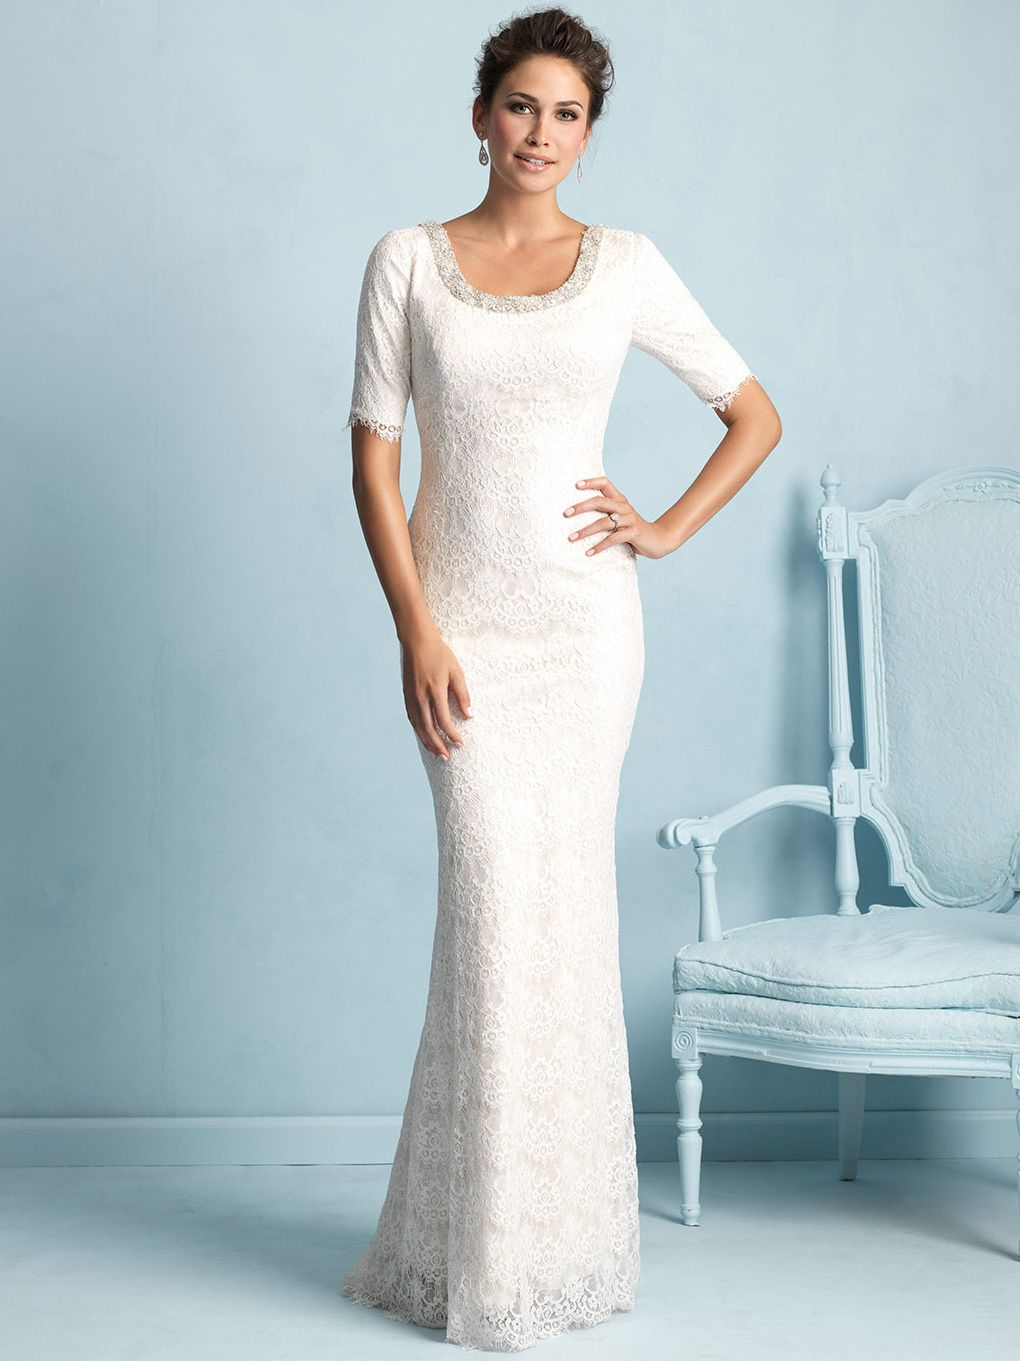 Famous Wedding Dresses For 2nd Weddings Motif - All Wedding Dresses ...